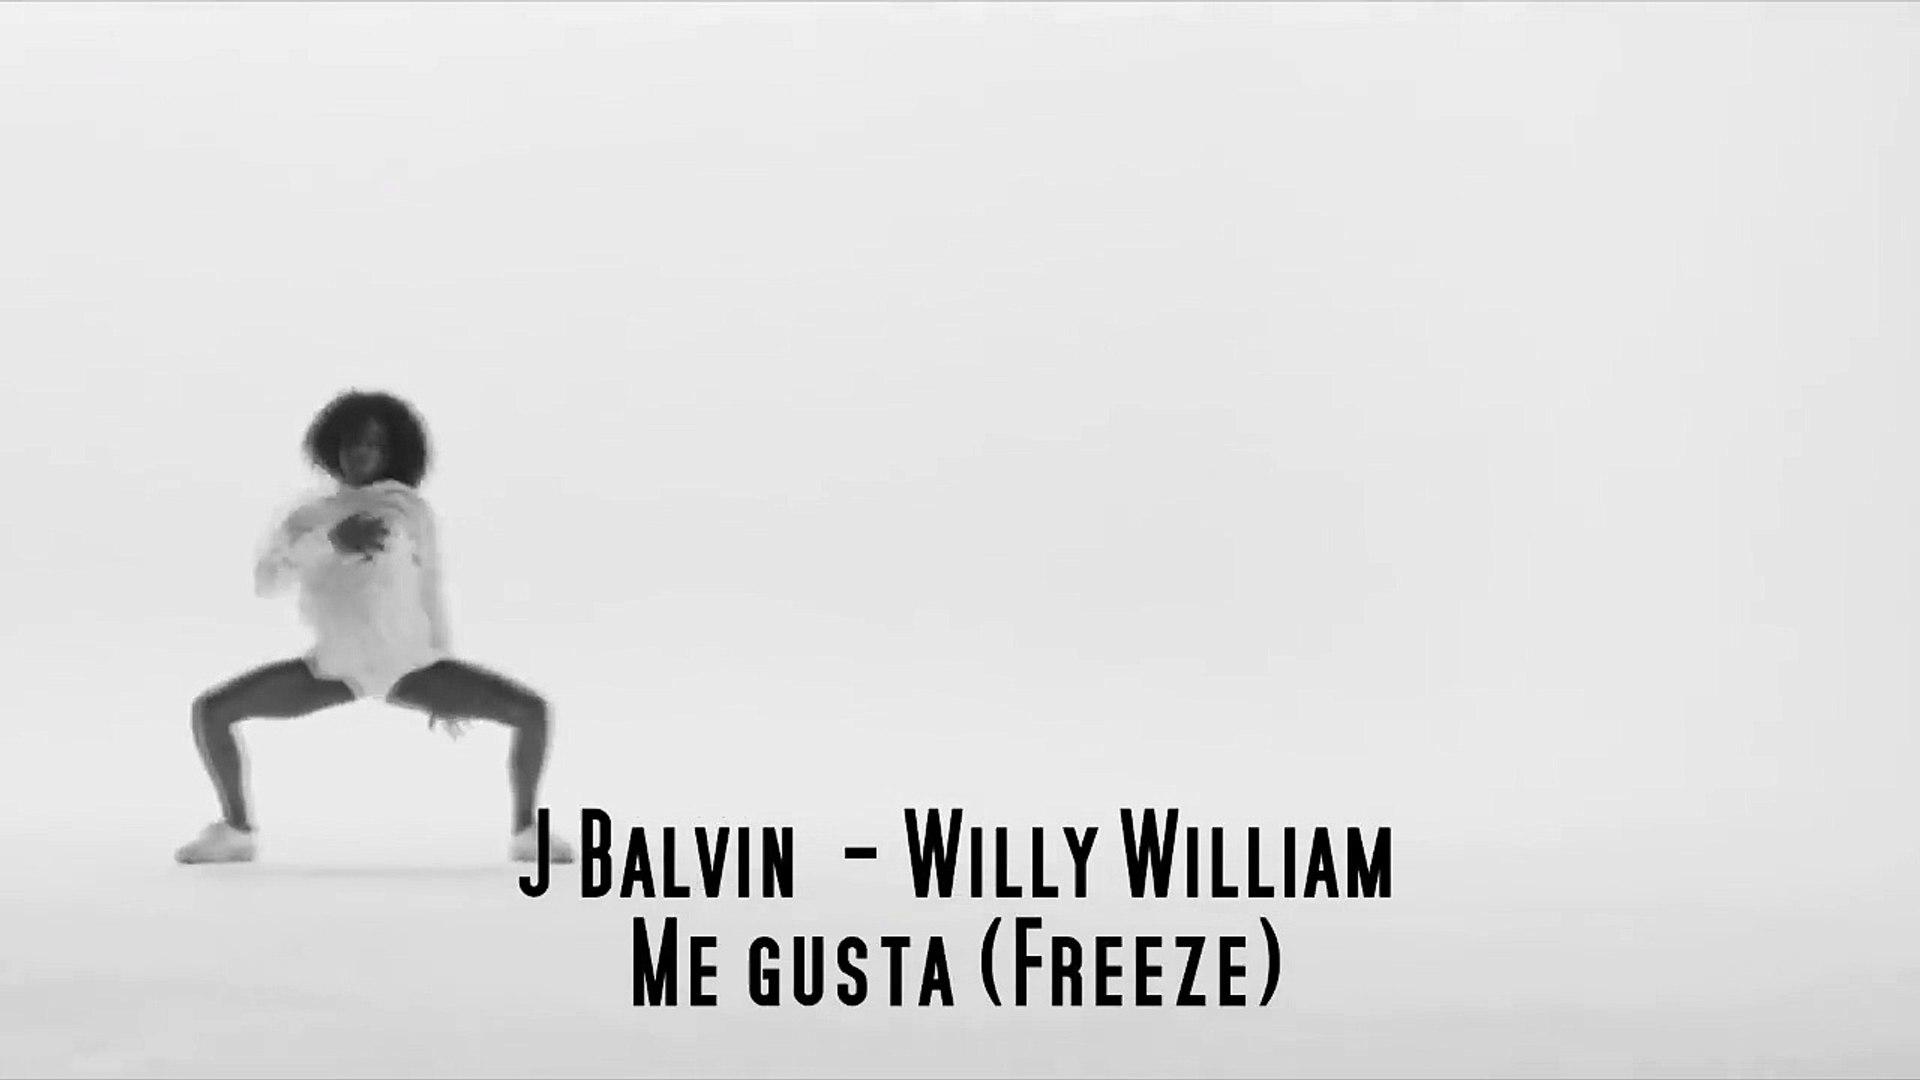 J Balvin - Mi Gente (Letra / Lyrics) Ft. Willy William (Dance Video)